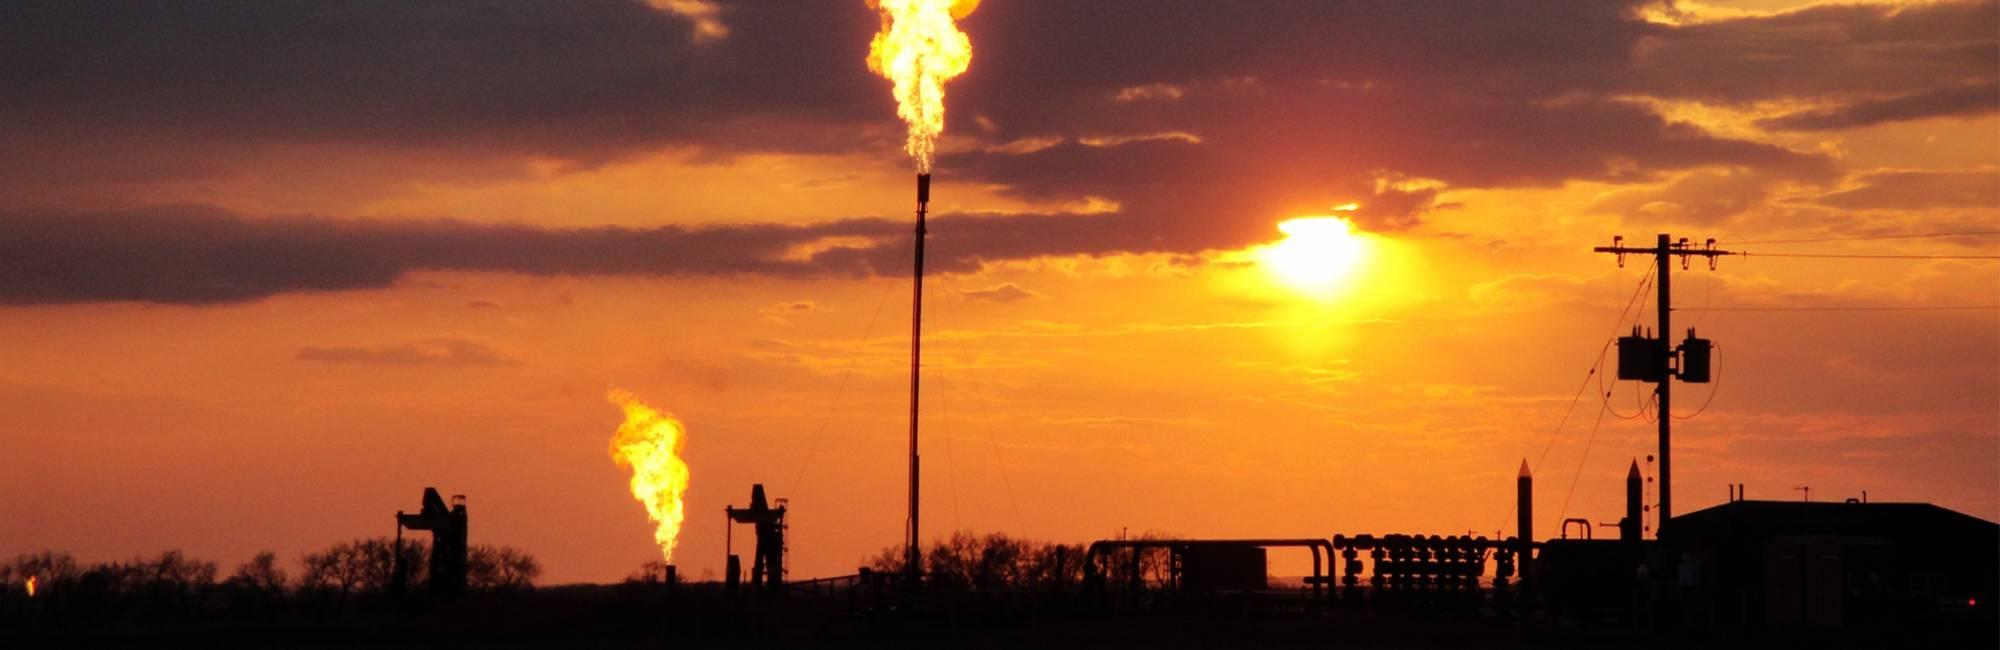 Methane flaring from a Bakken Field, North Dakota well site in 2014.